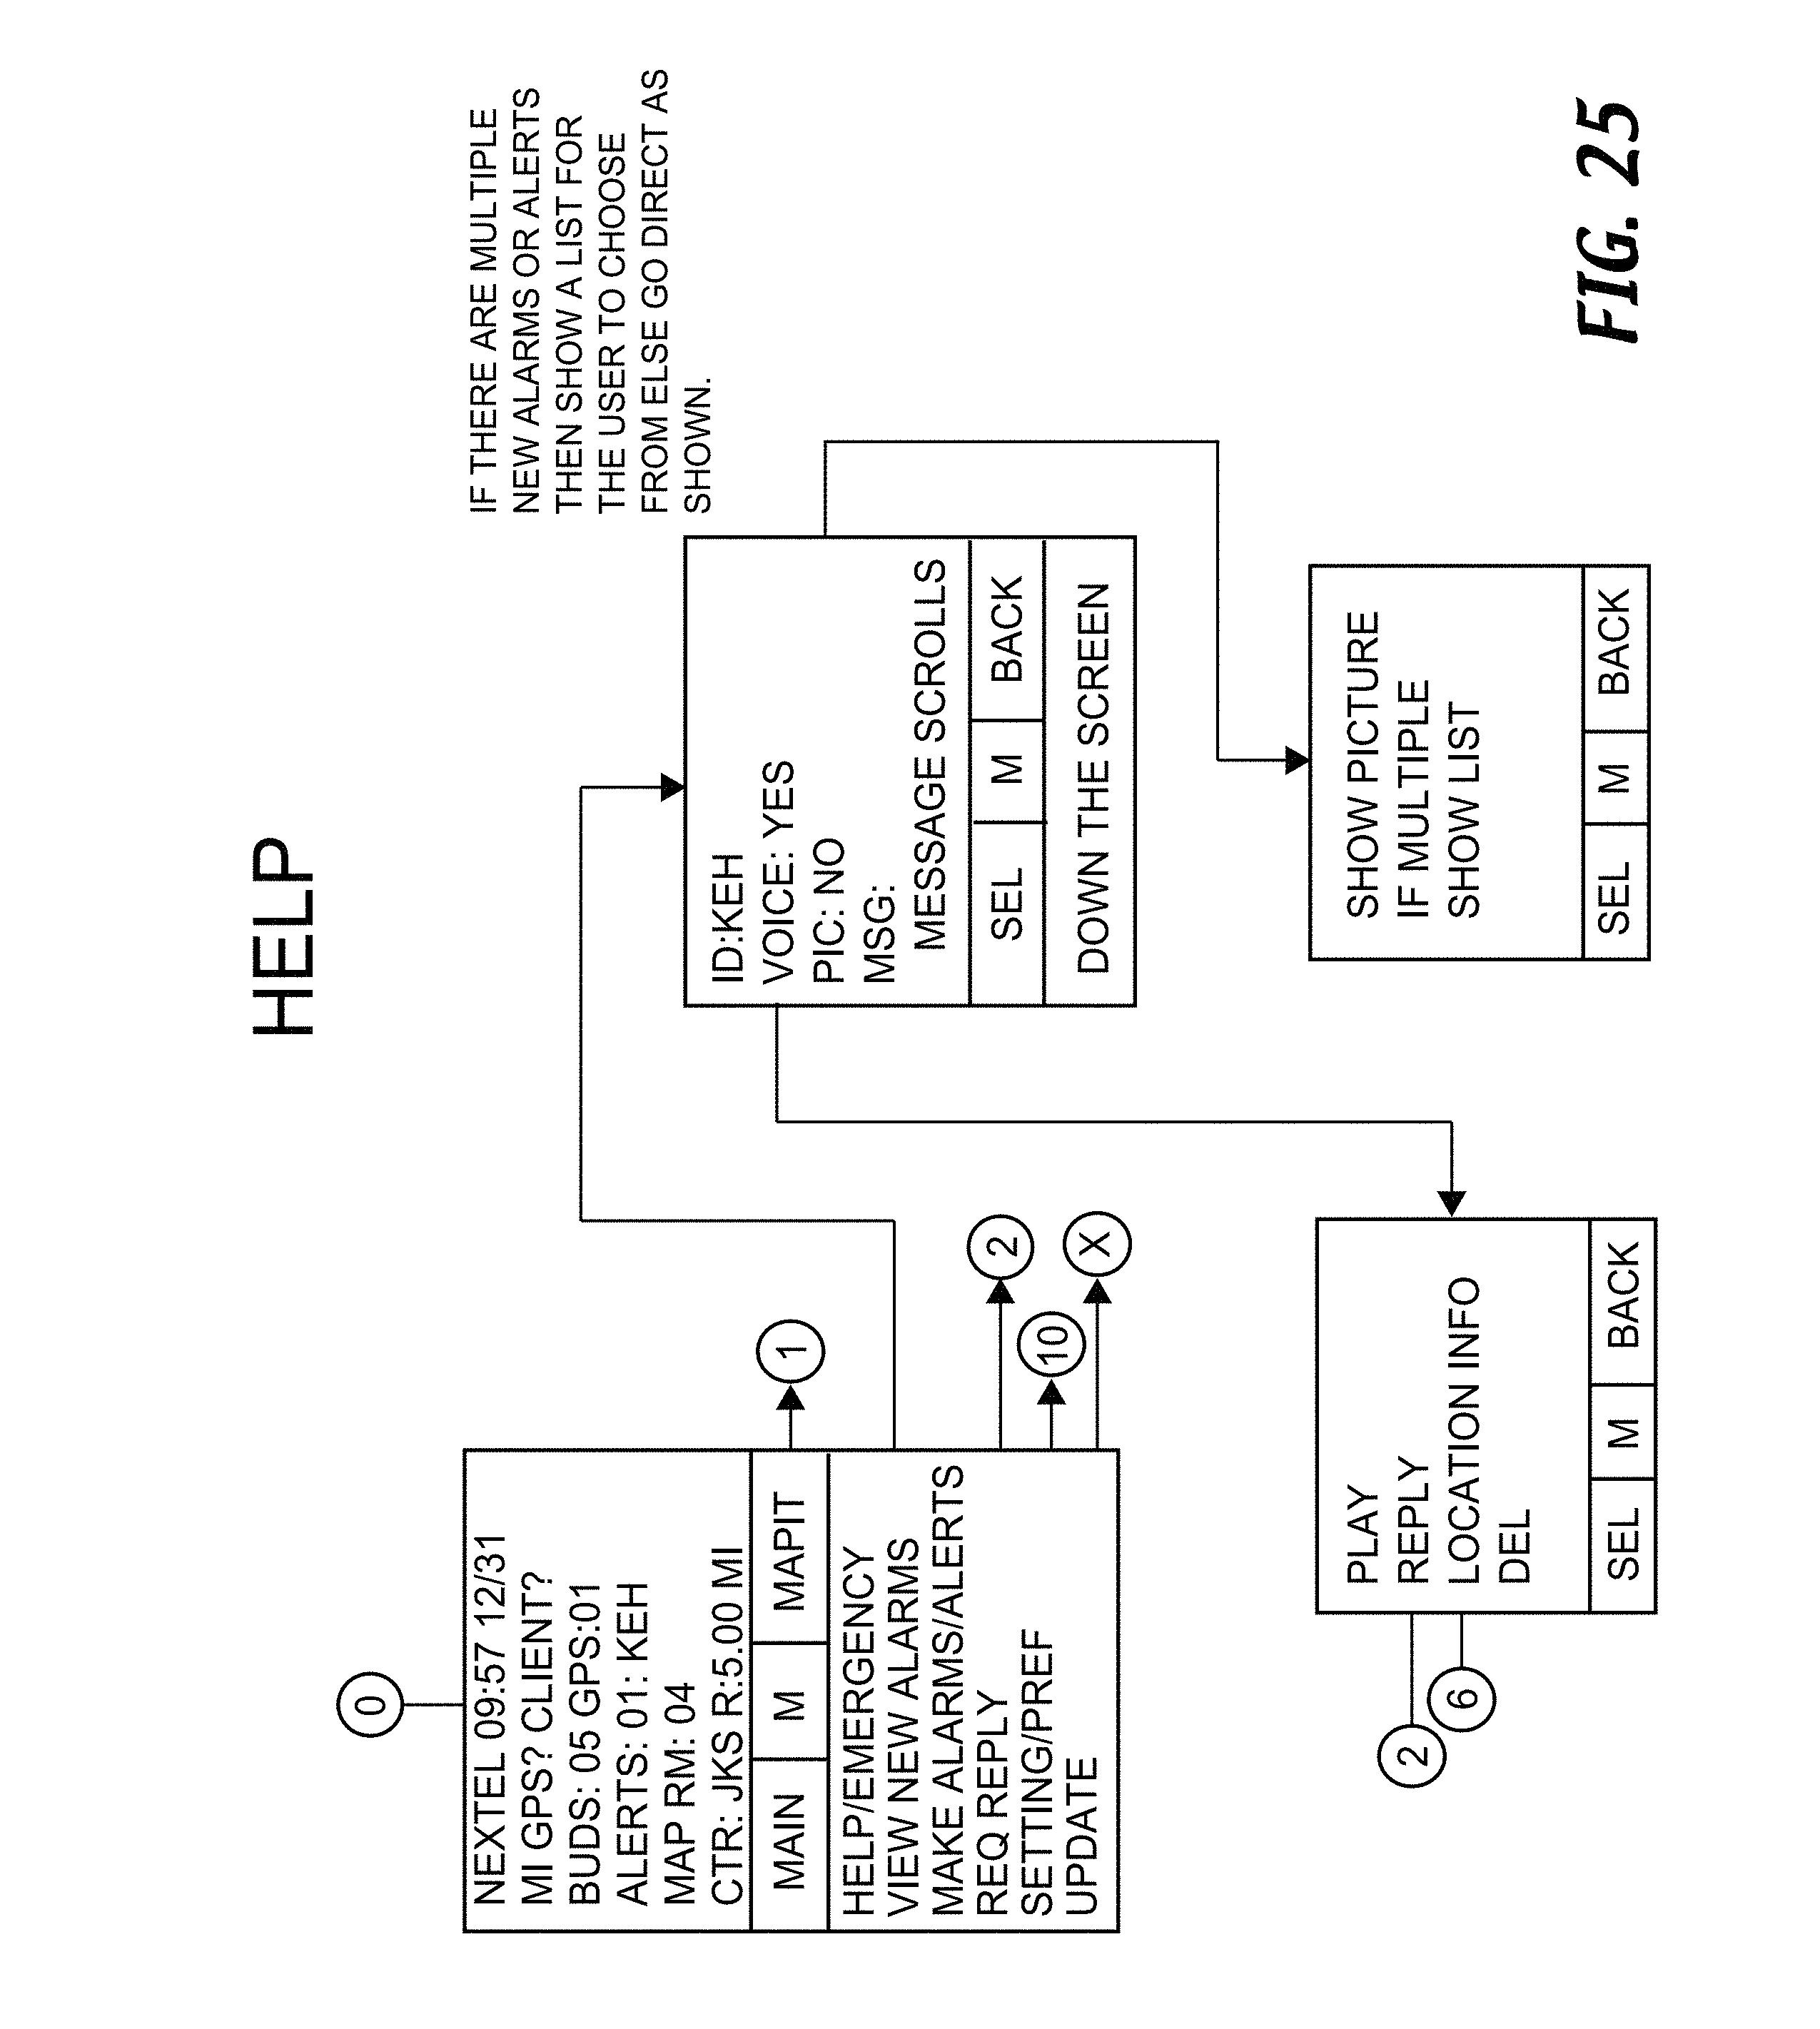 Patent US 10,149,092 B1